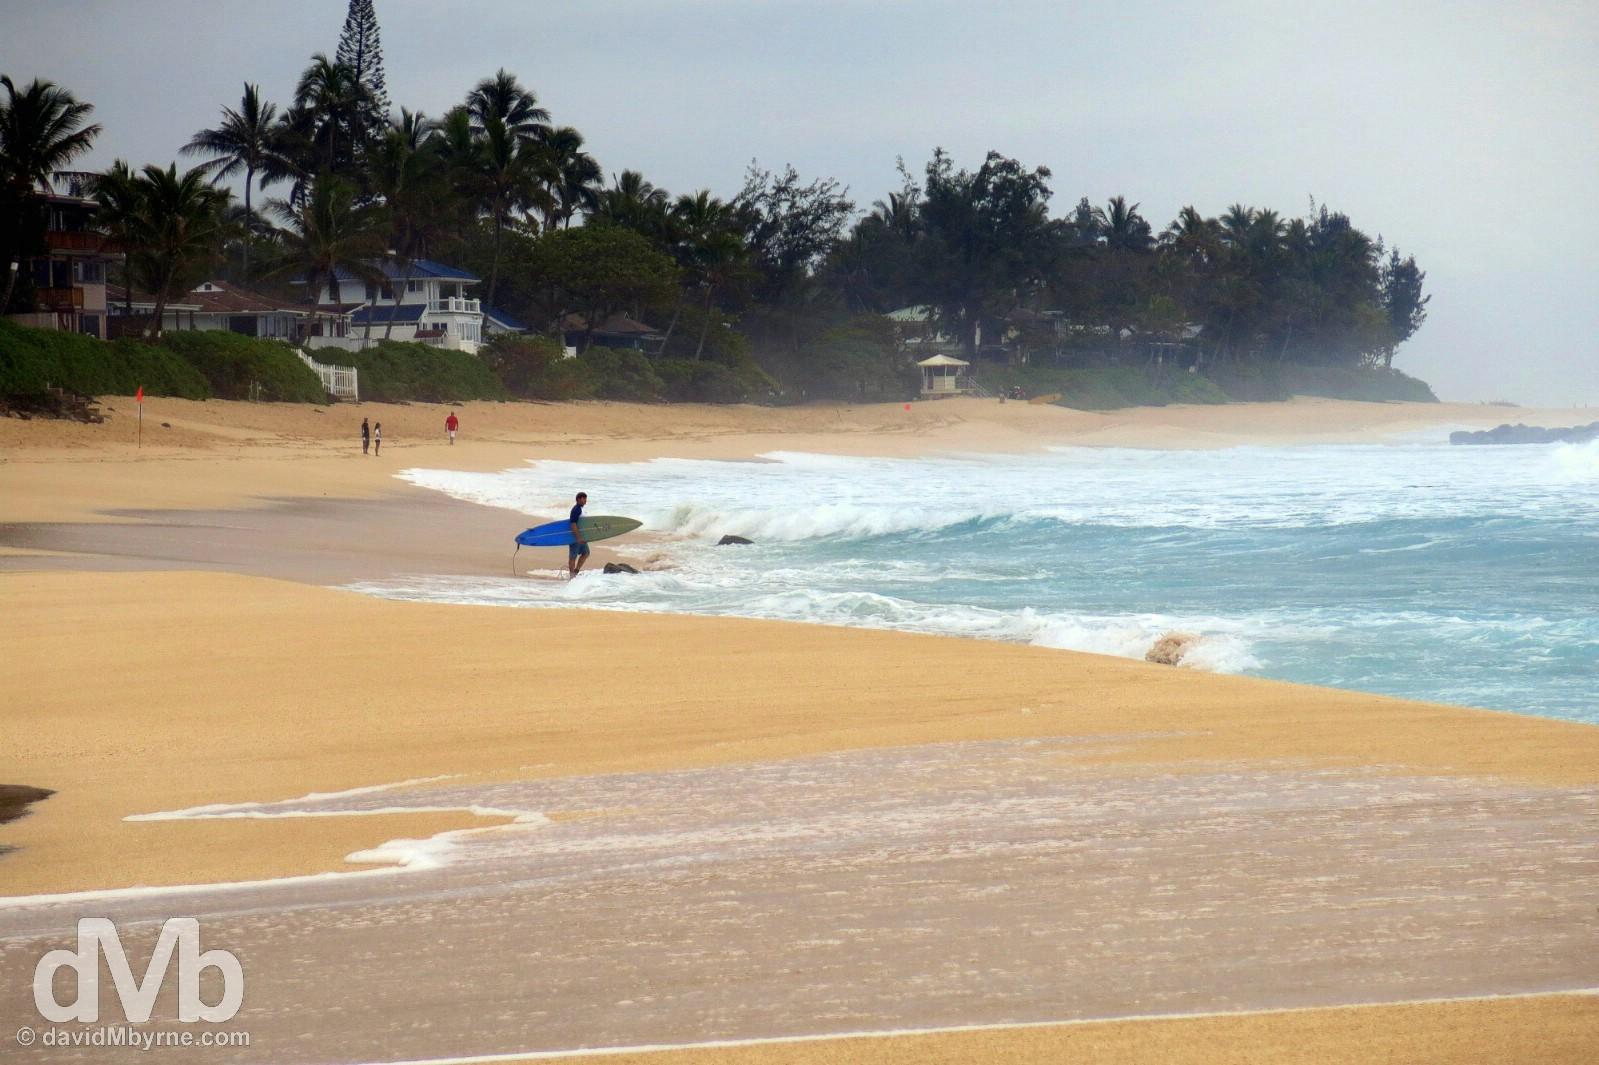 Ehukai Beach Park, Pupukea, North Shore, Oahu, Hawaii, USA. March 10, 2013.